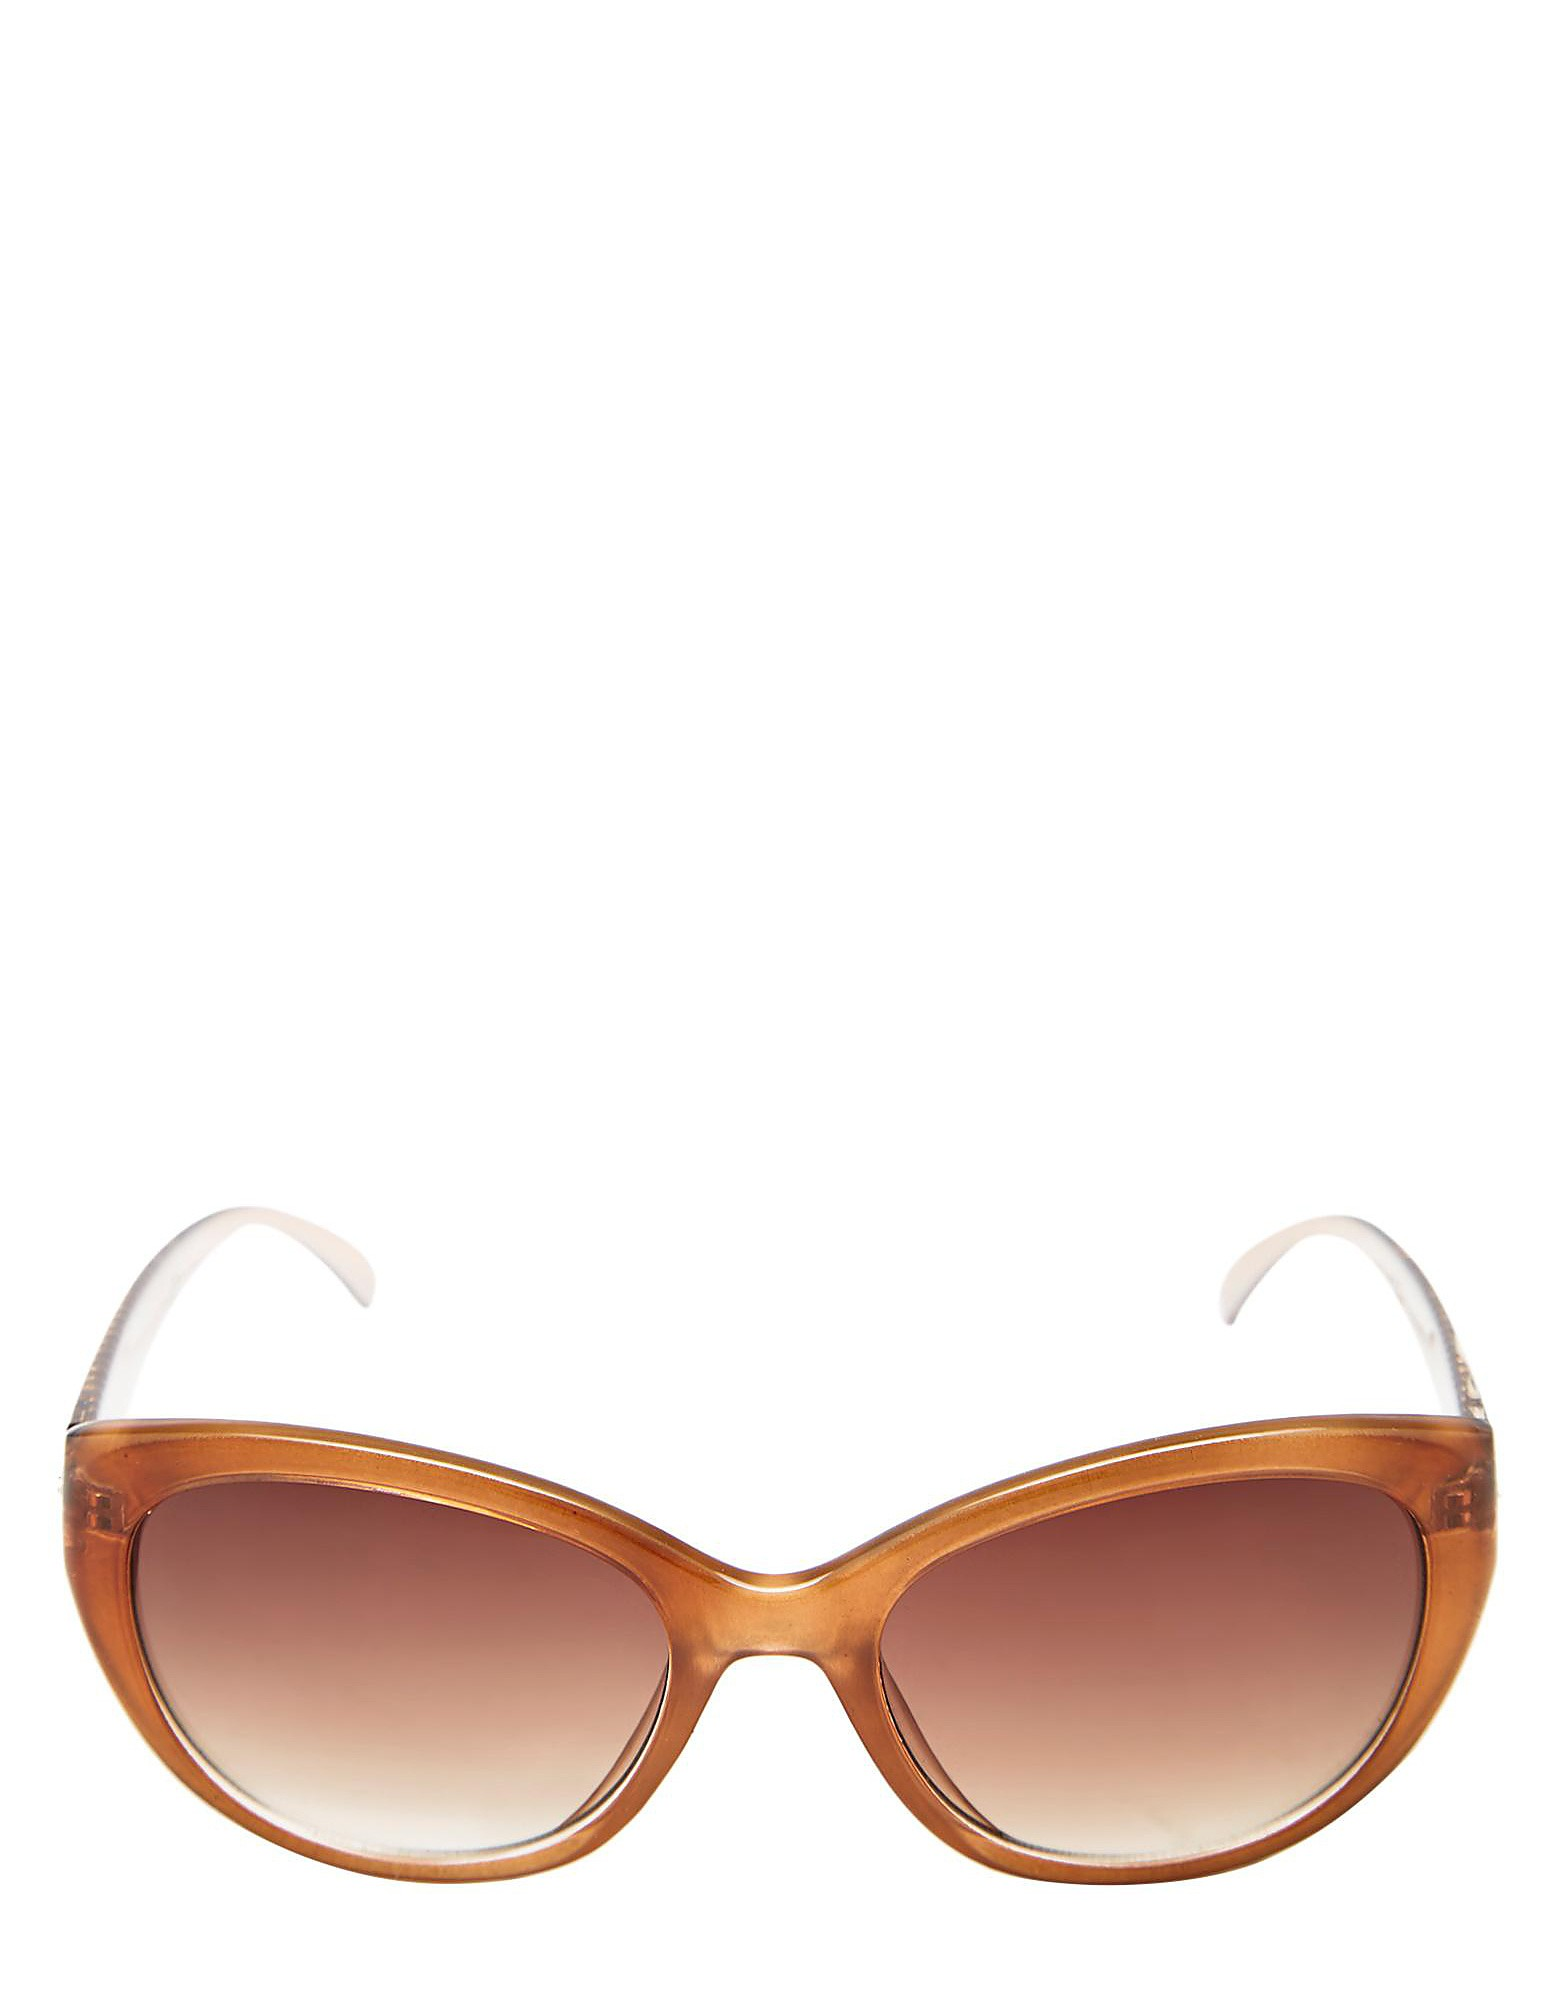 Brookhaven Alex Sunglasses